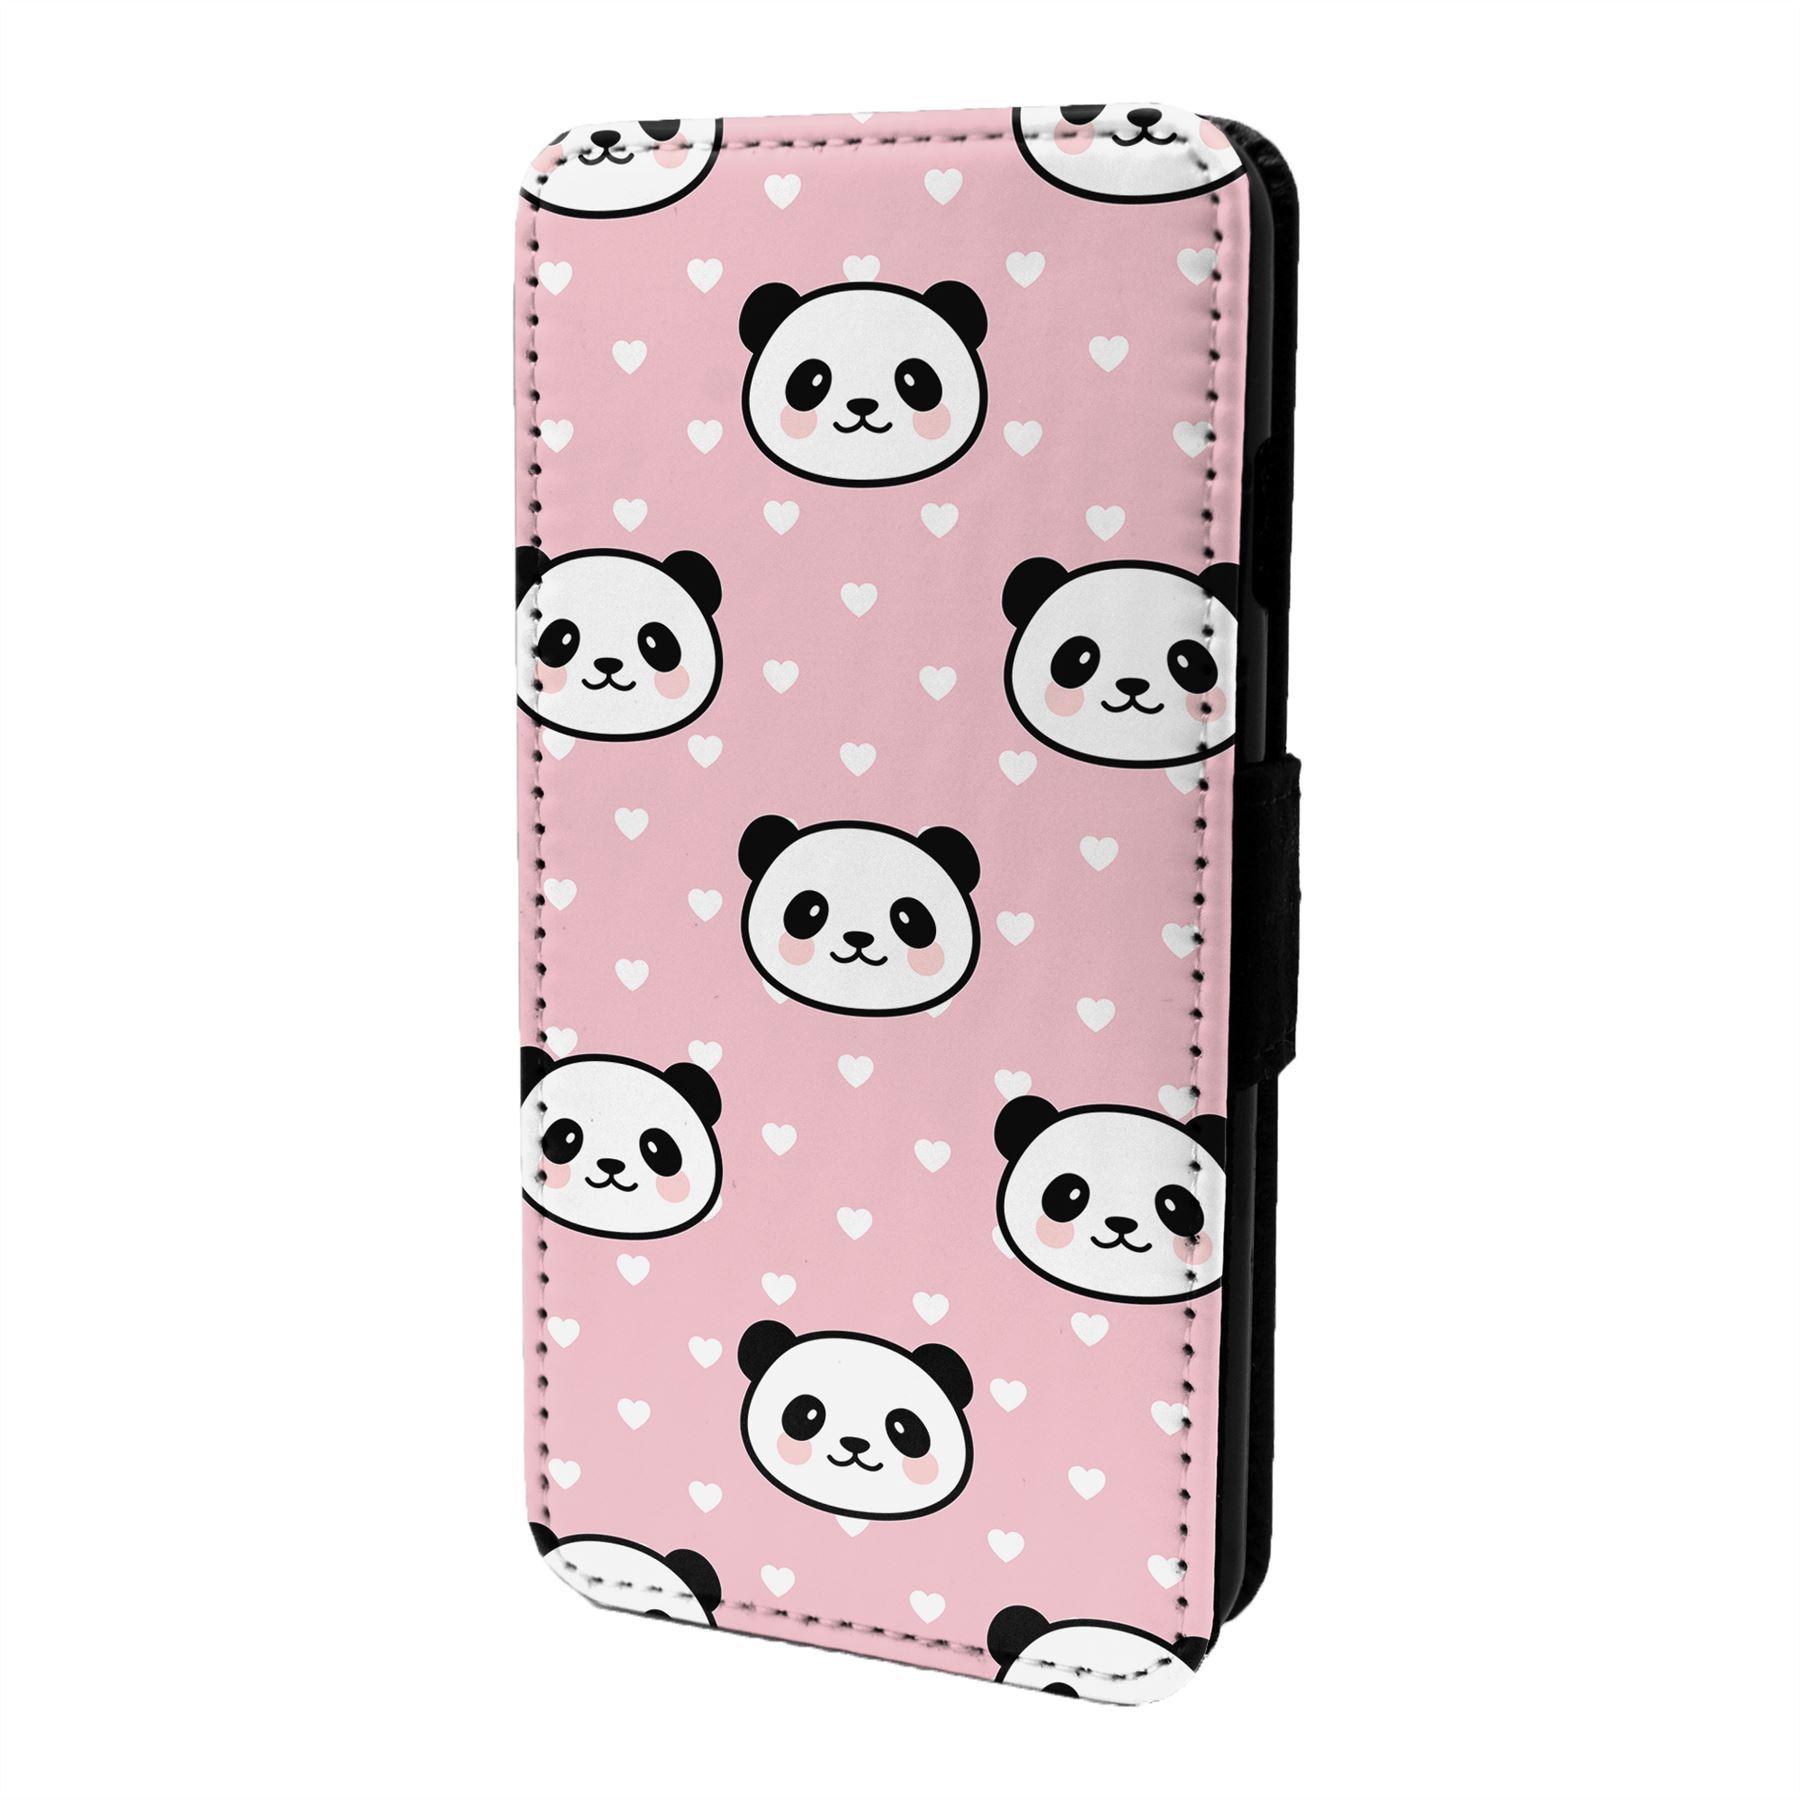 Panda-Motif-Etui-Rabattable-pour-Telephone-Portable-S7006